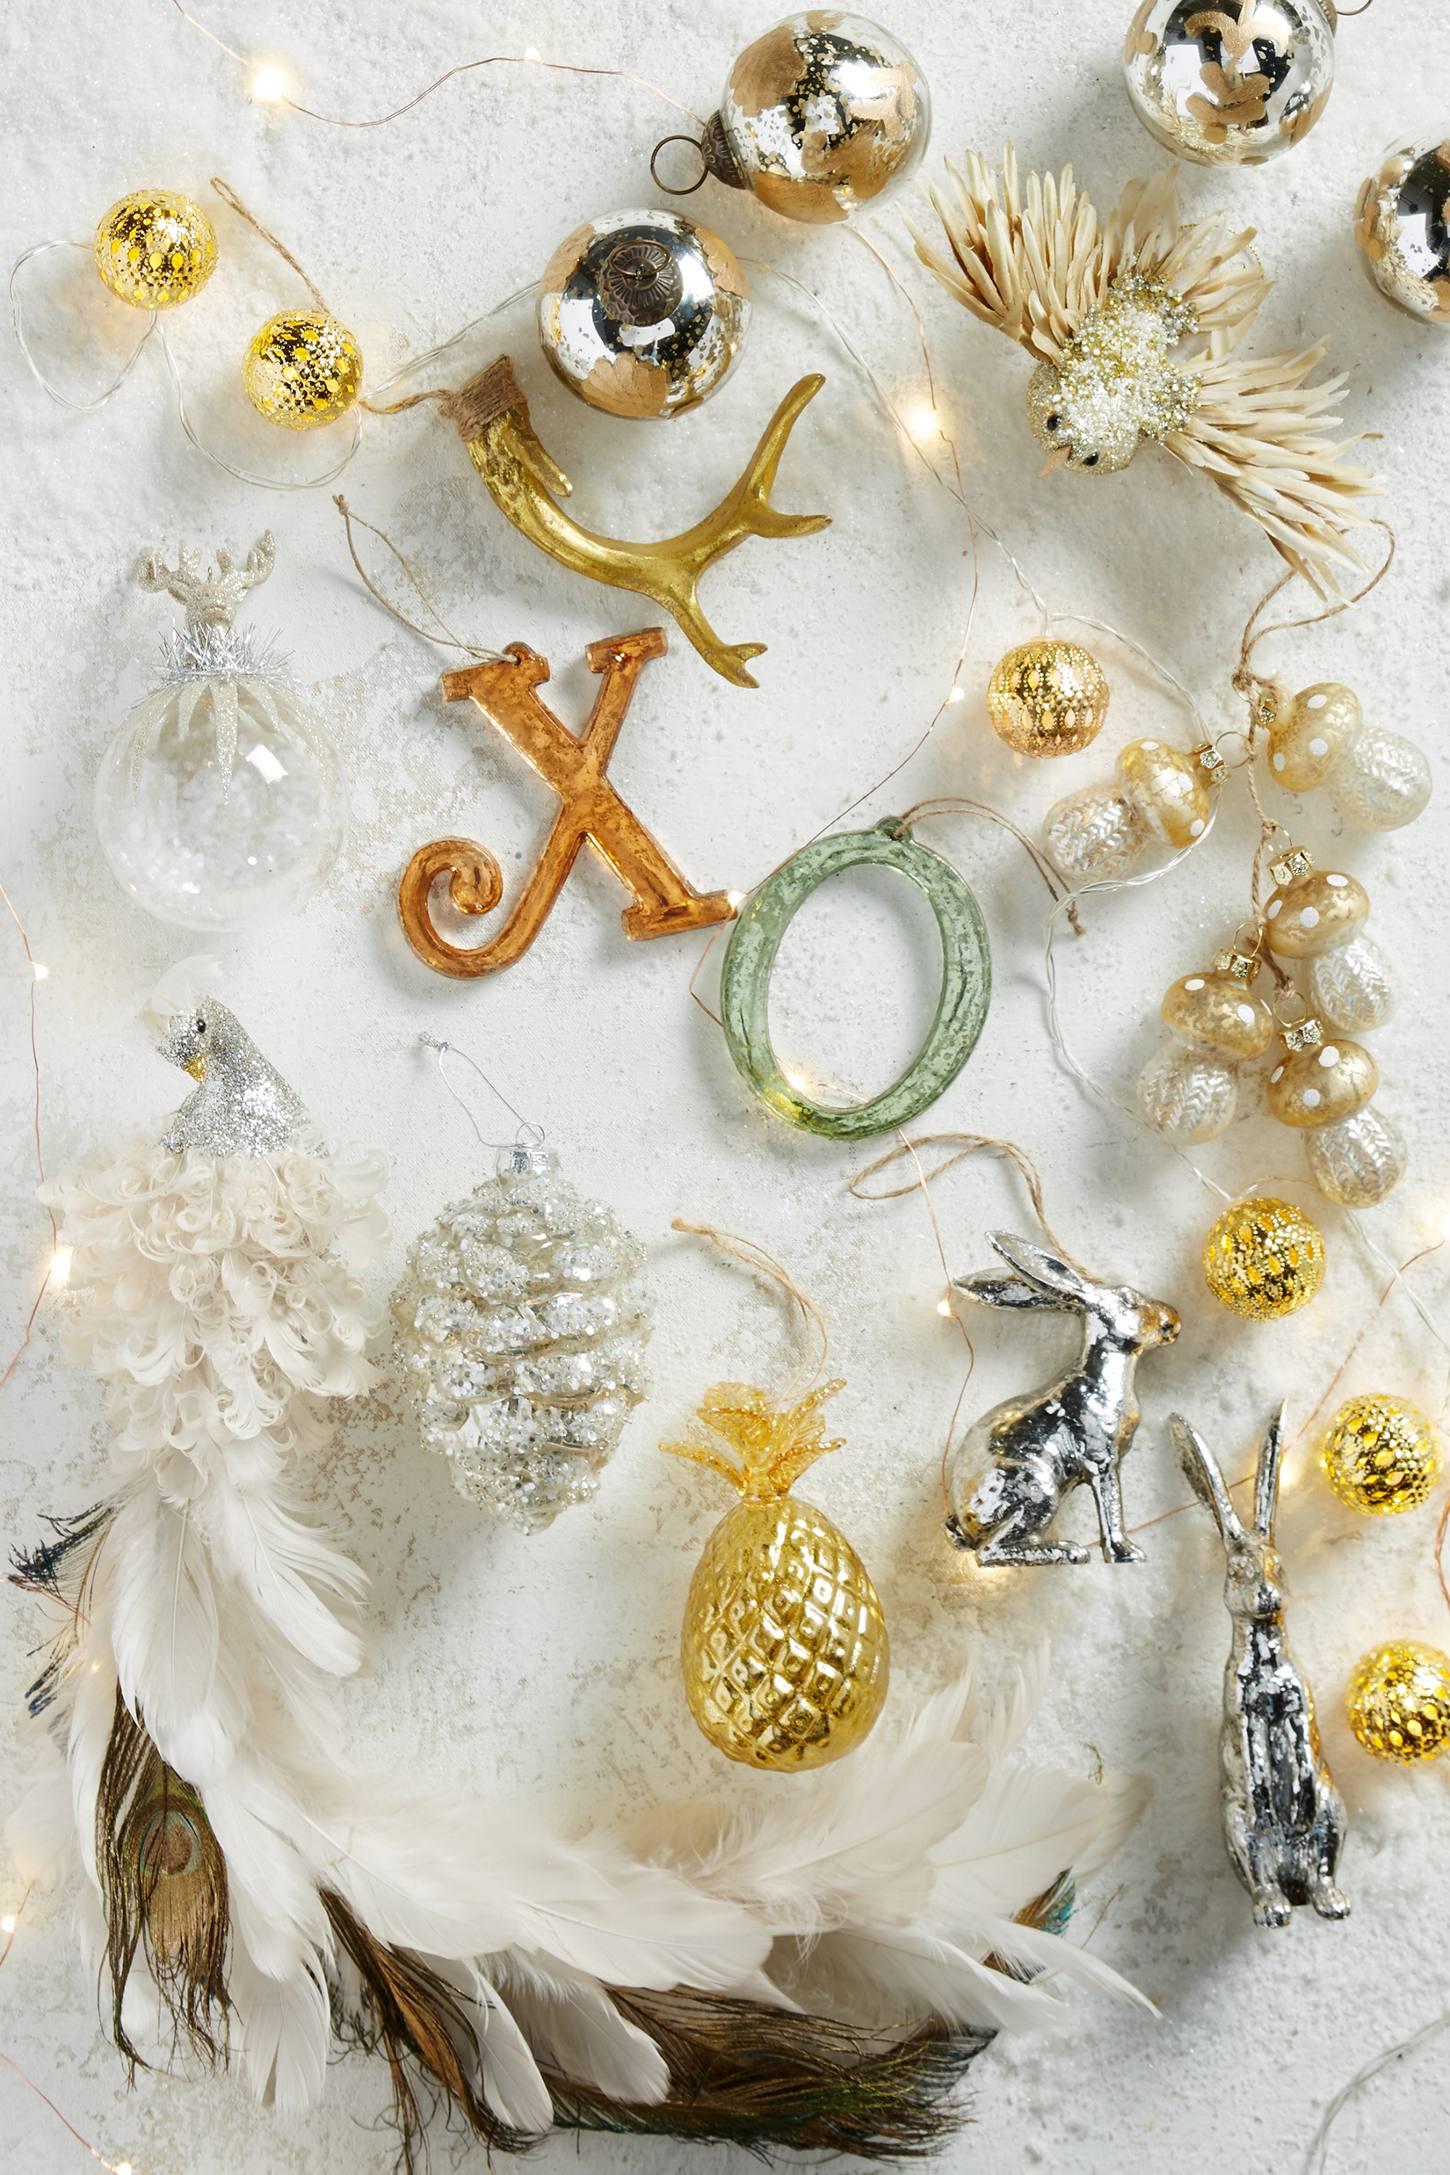 Glittering Mushroom Cluster Ornament